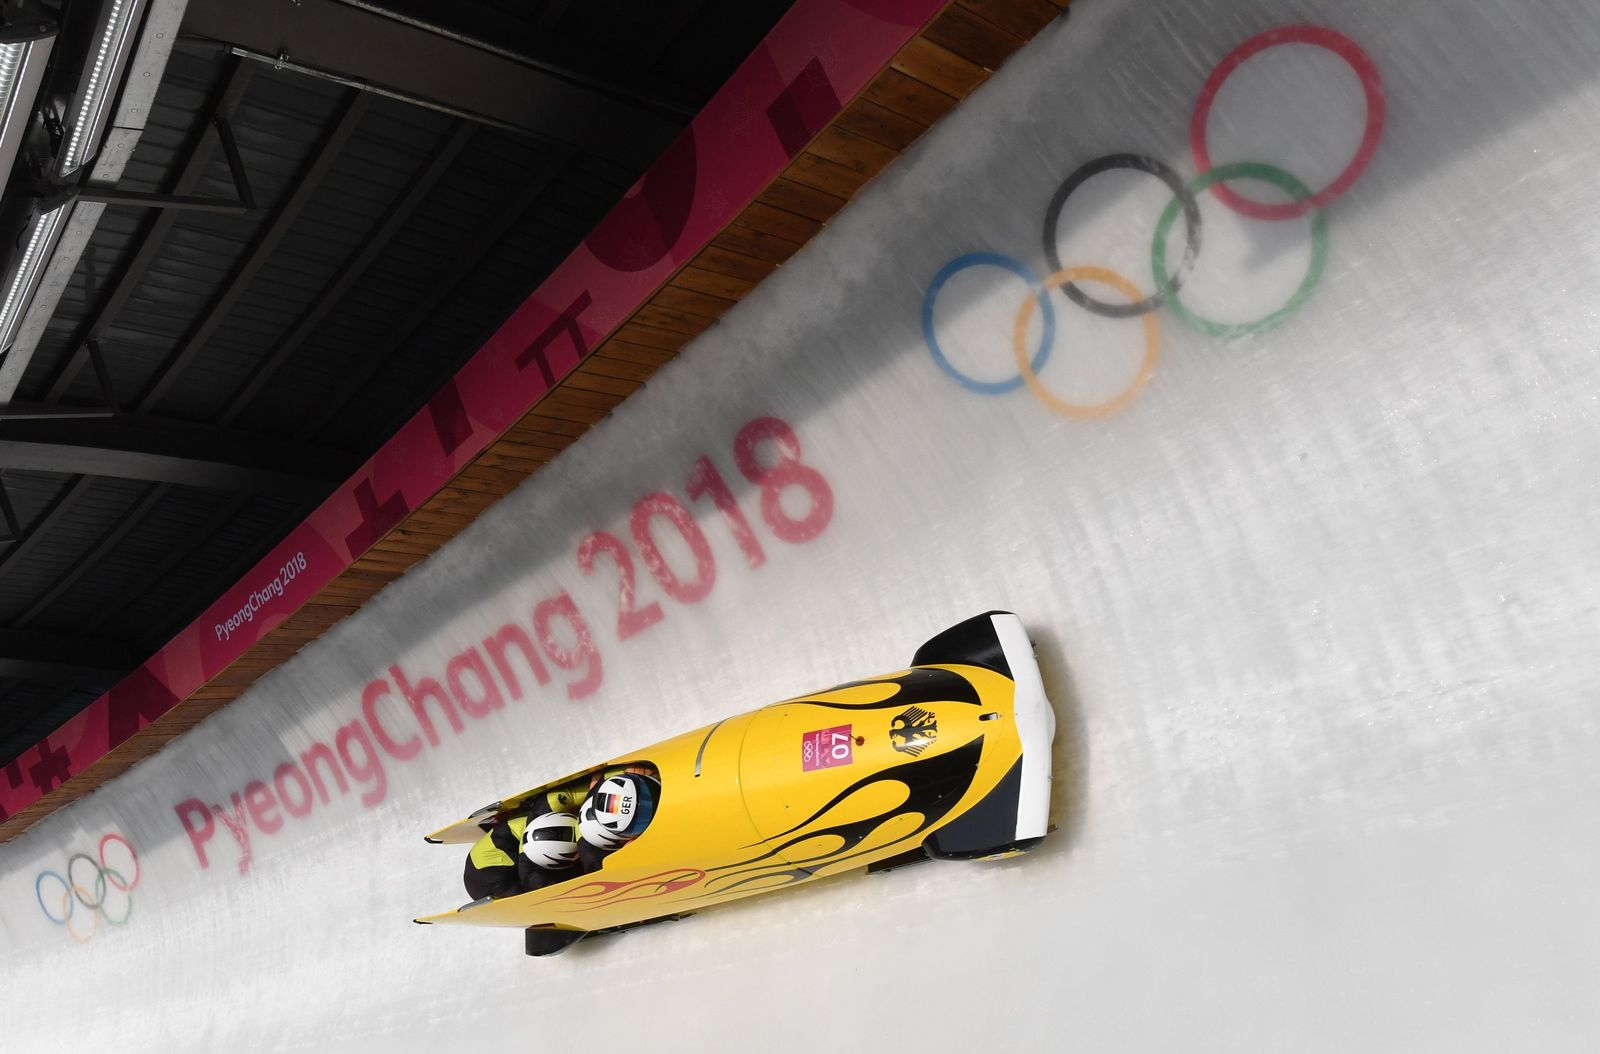 Pyeongchang 2018 - Bob